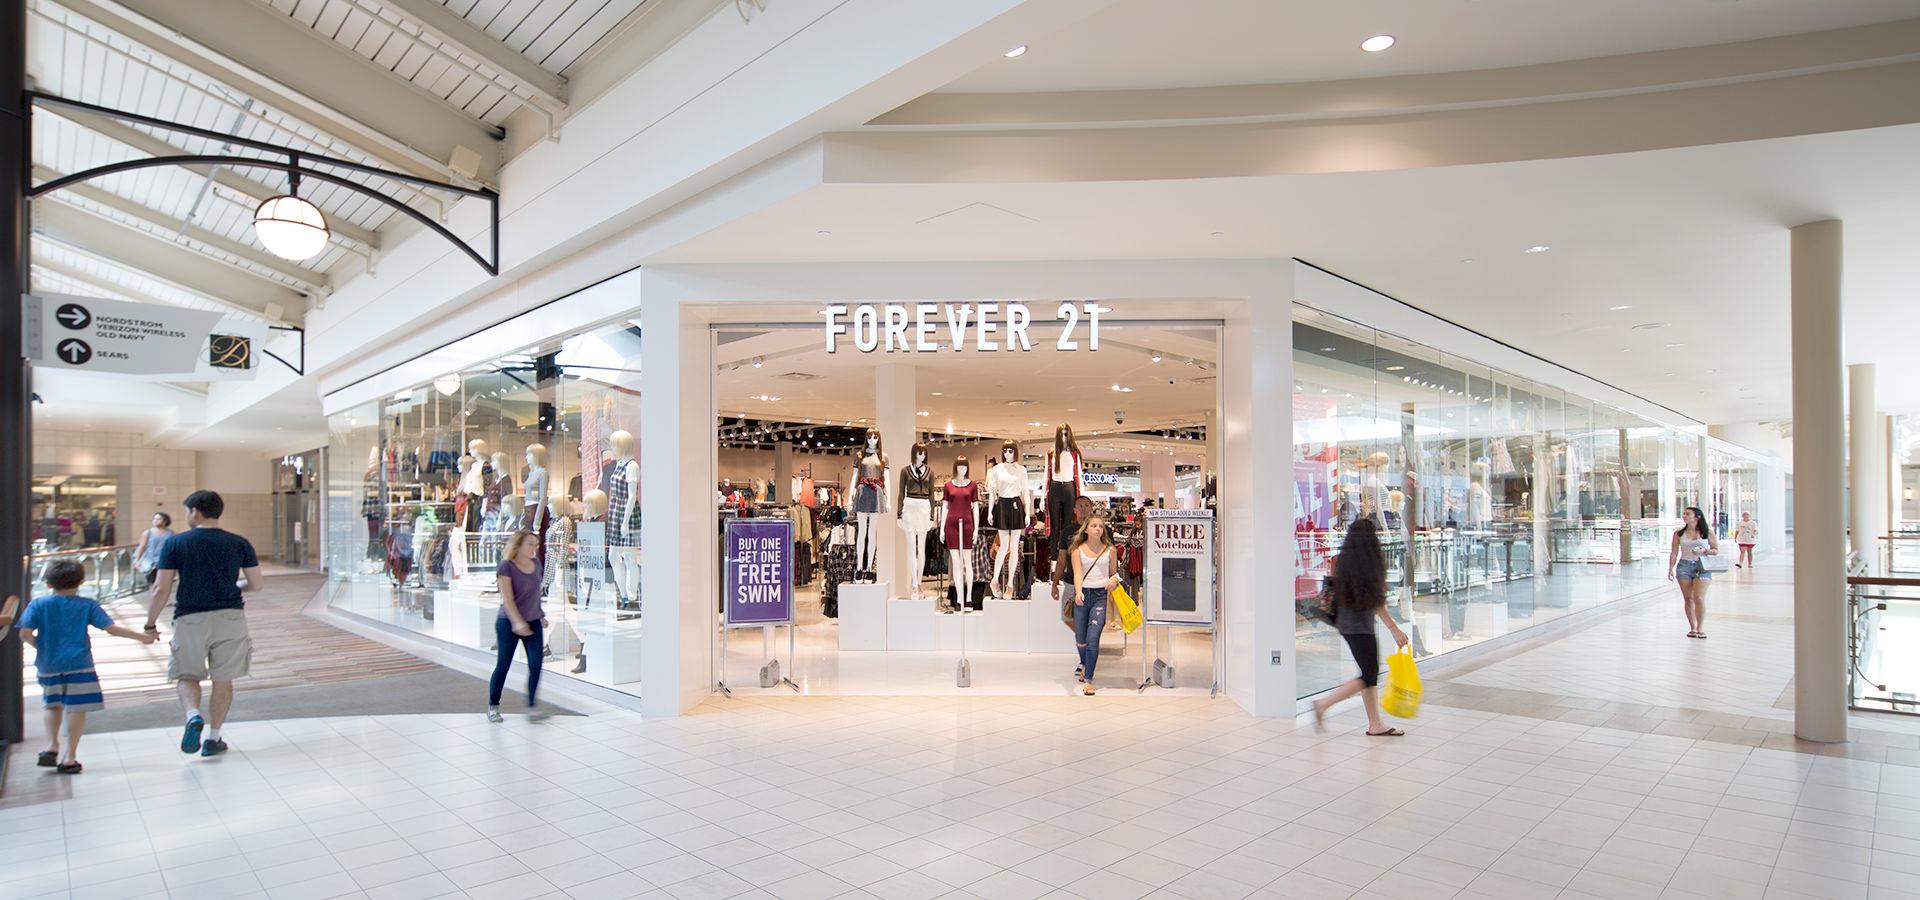 Forever 21 Near Me In Dulles VA  Dulles Town Center